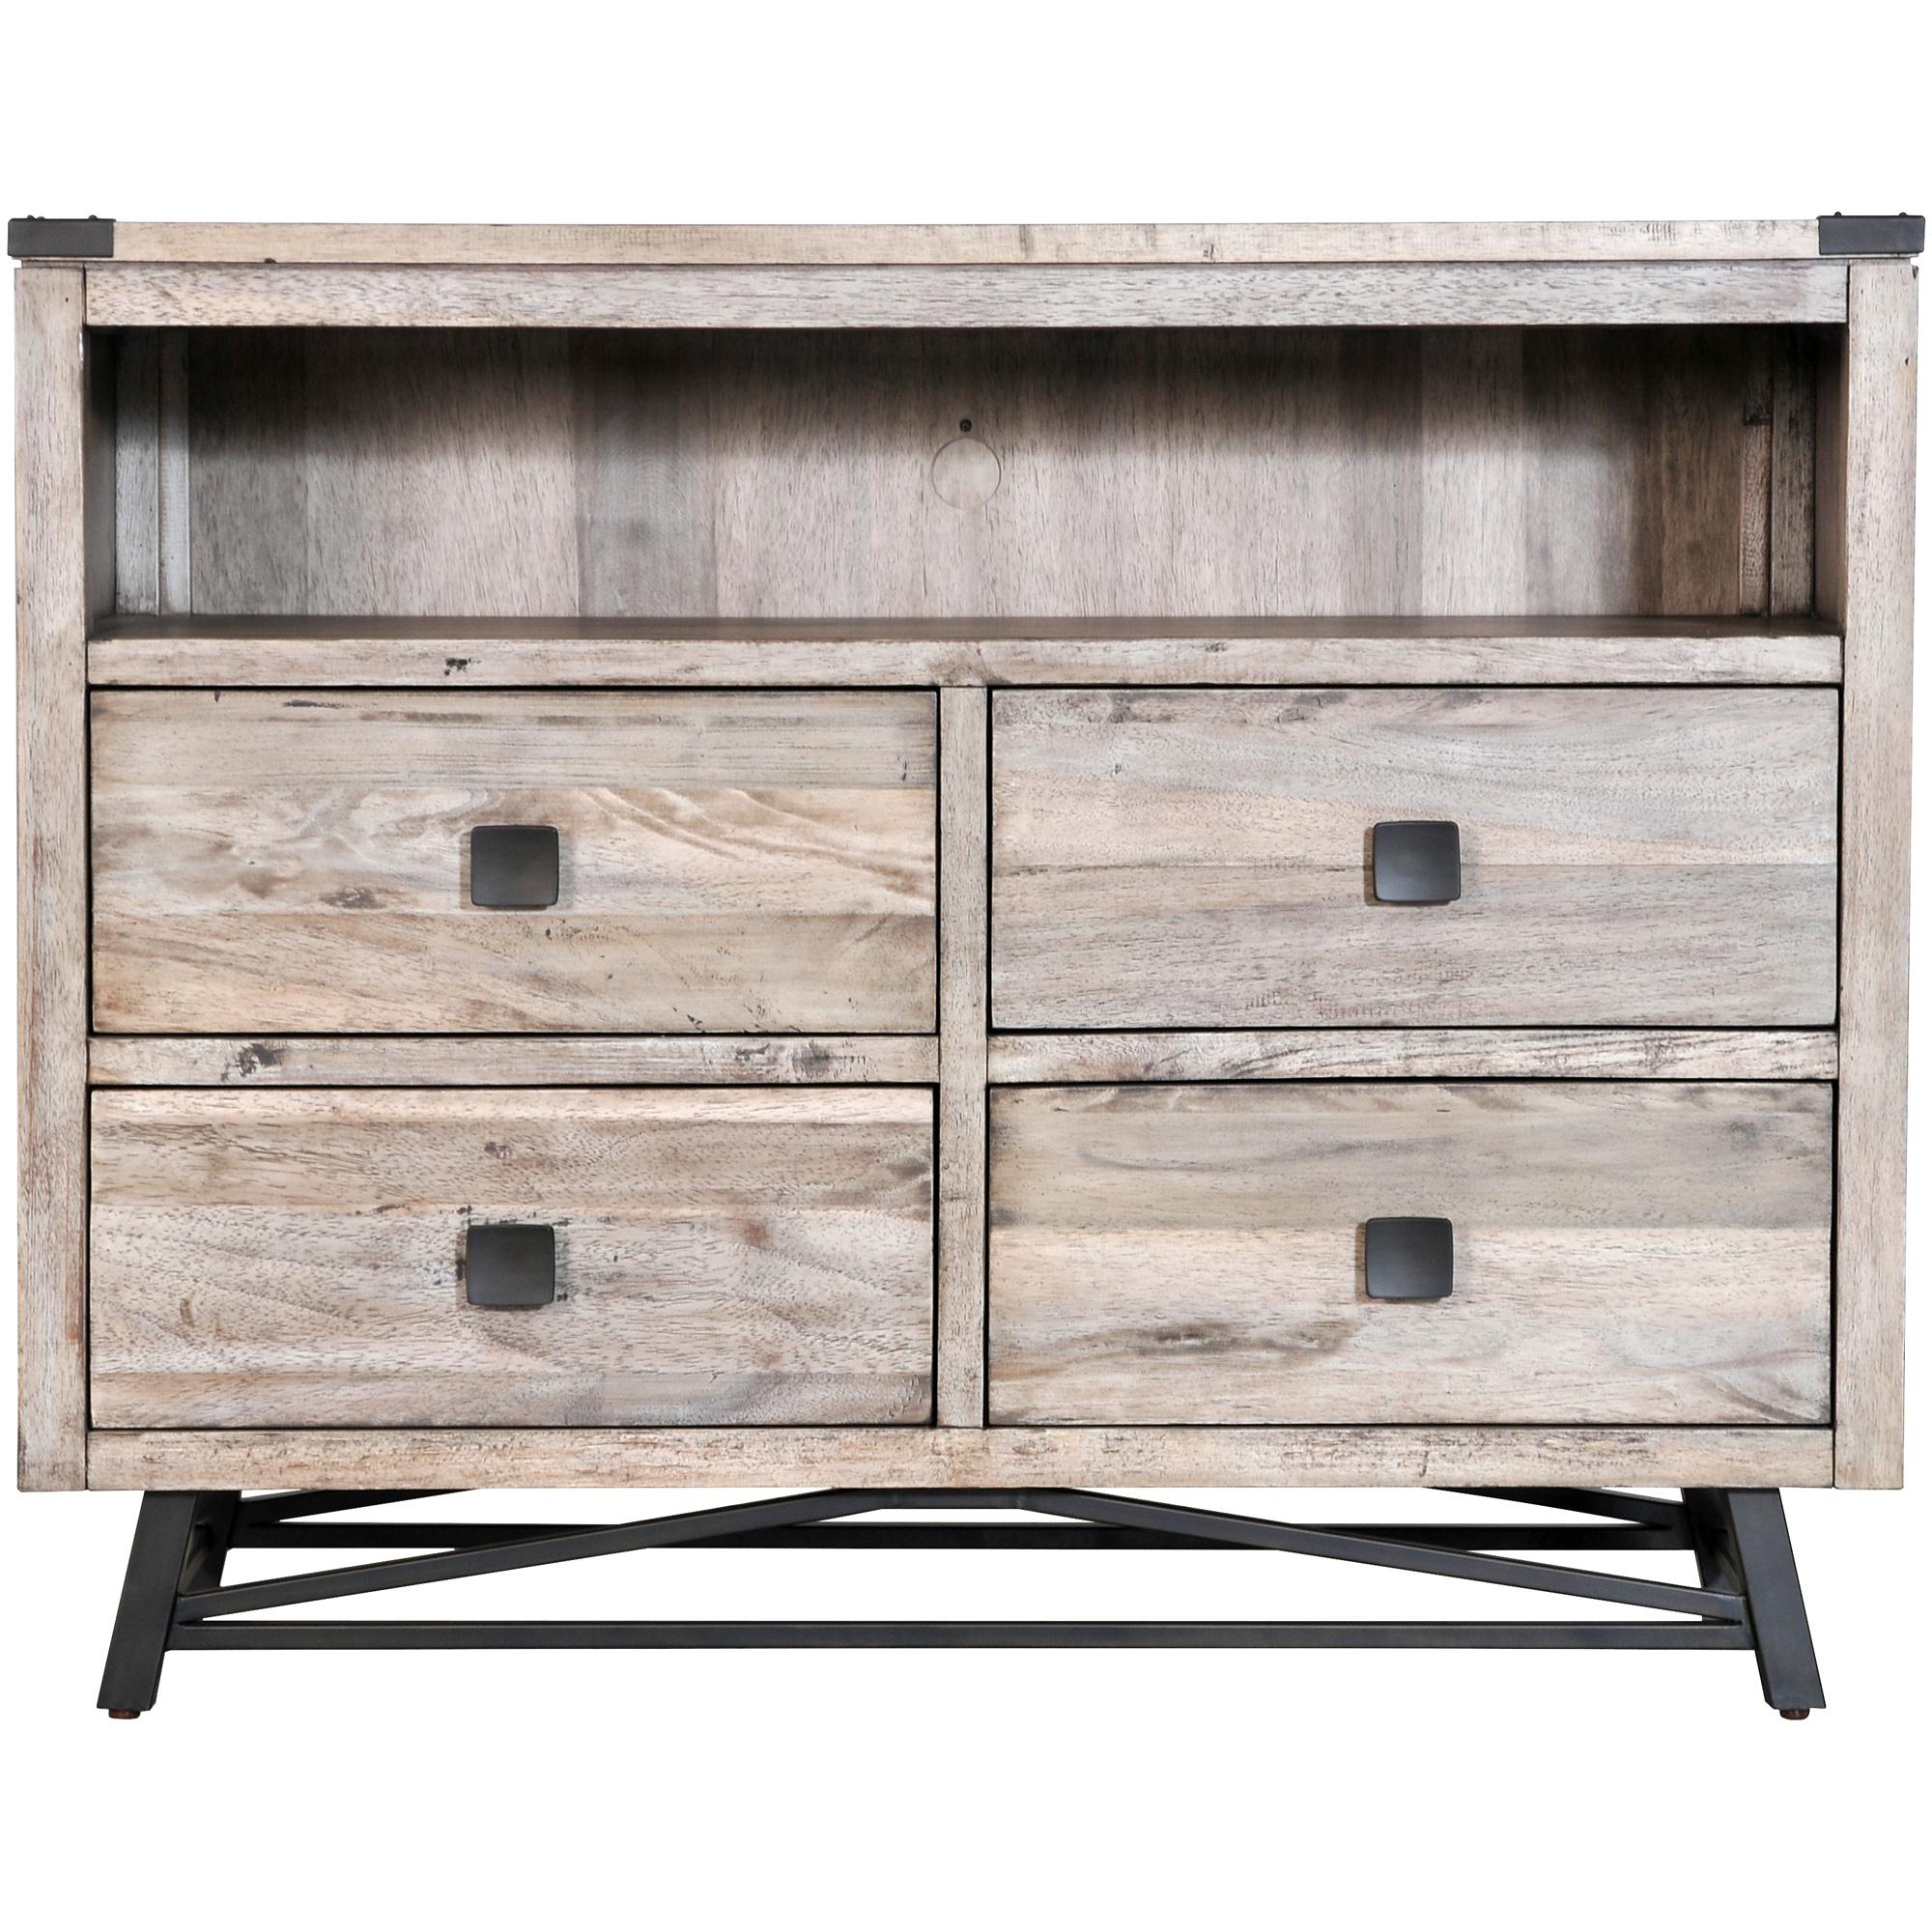 Napa Furniture   Brentwood Chestnut Media Chest